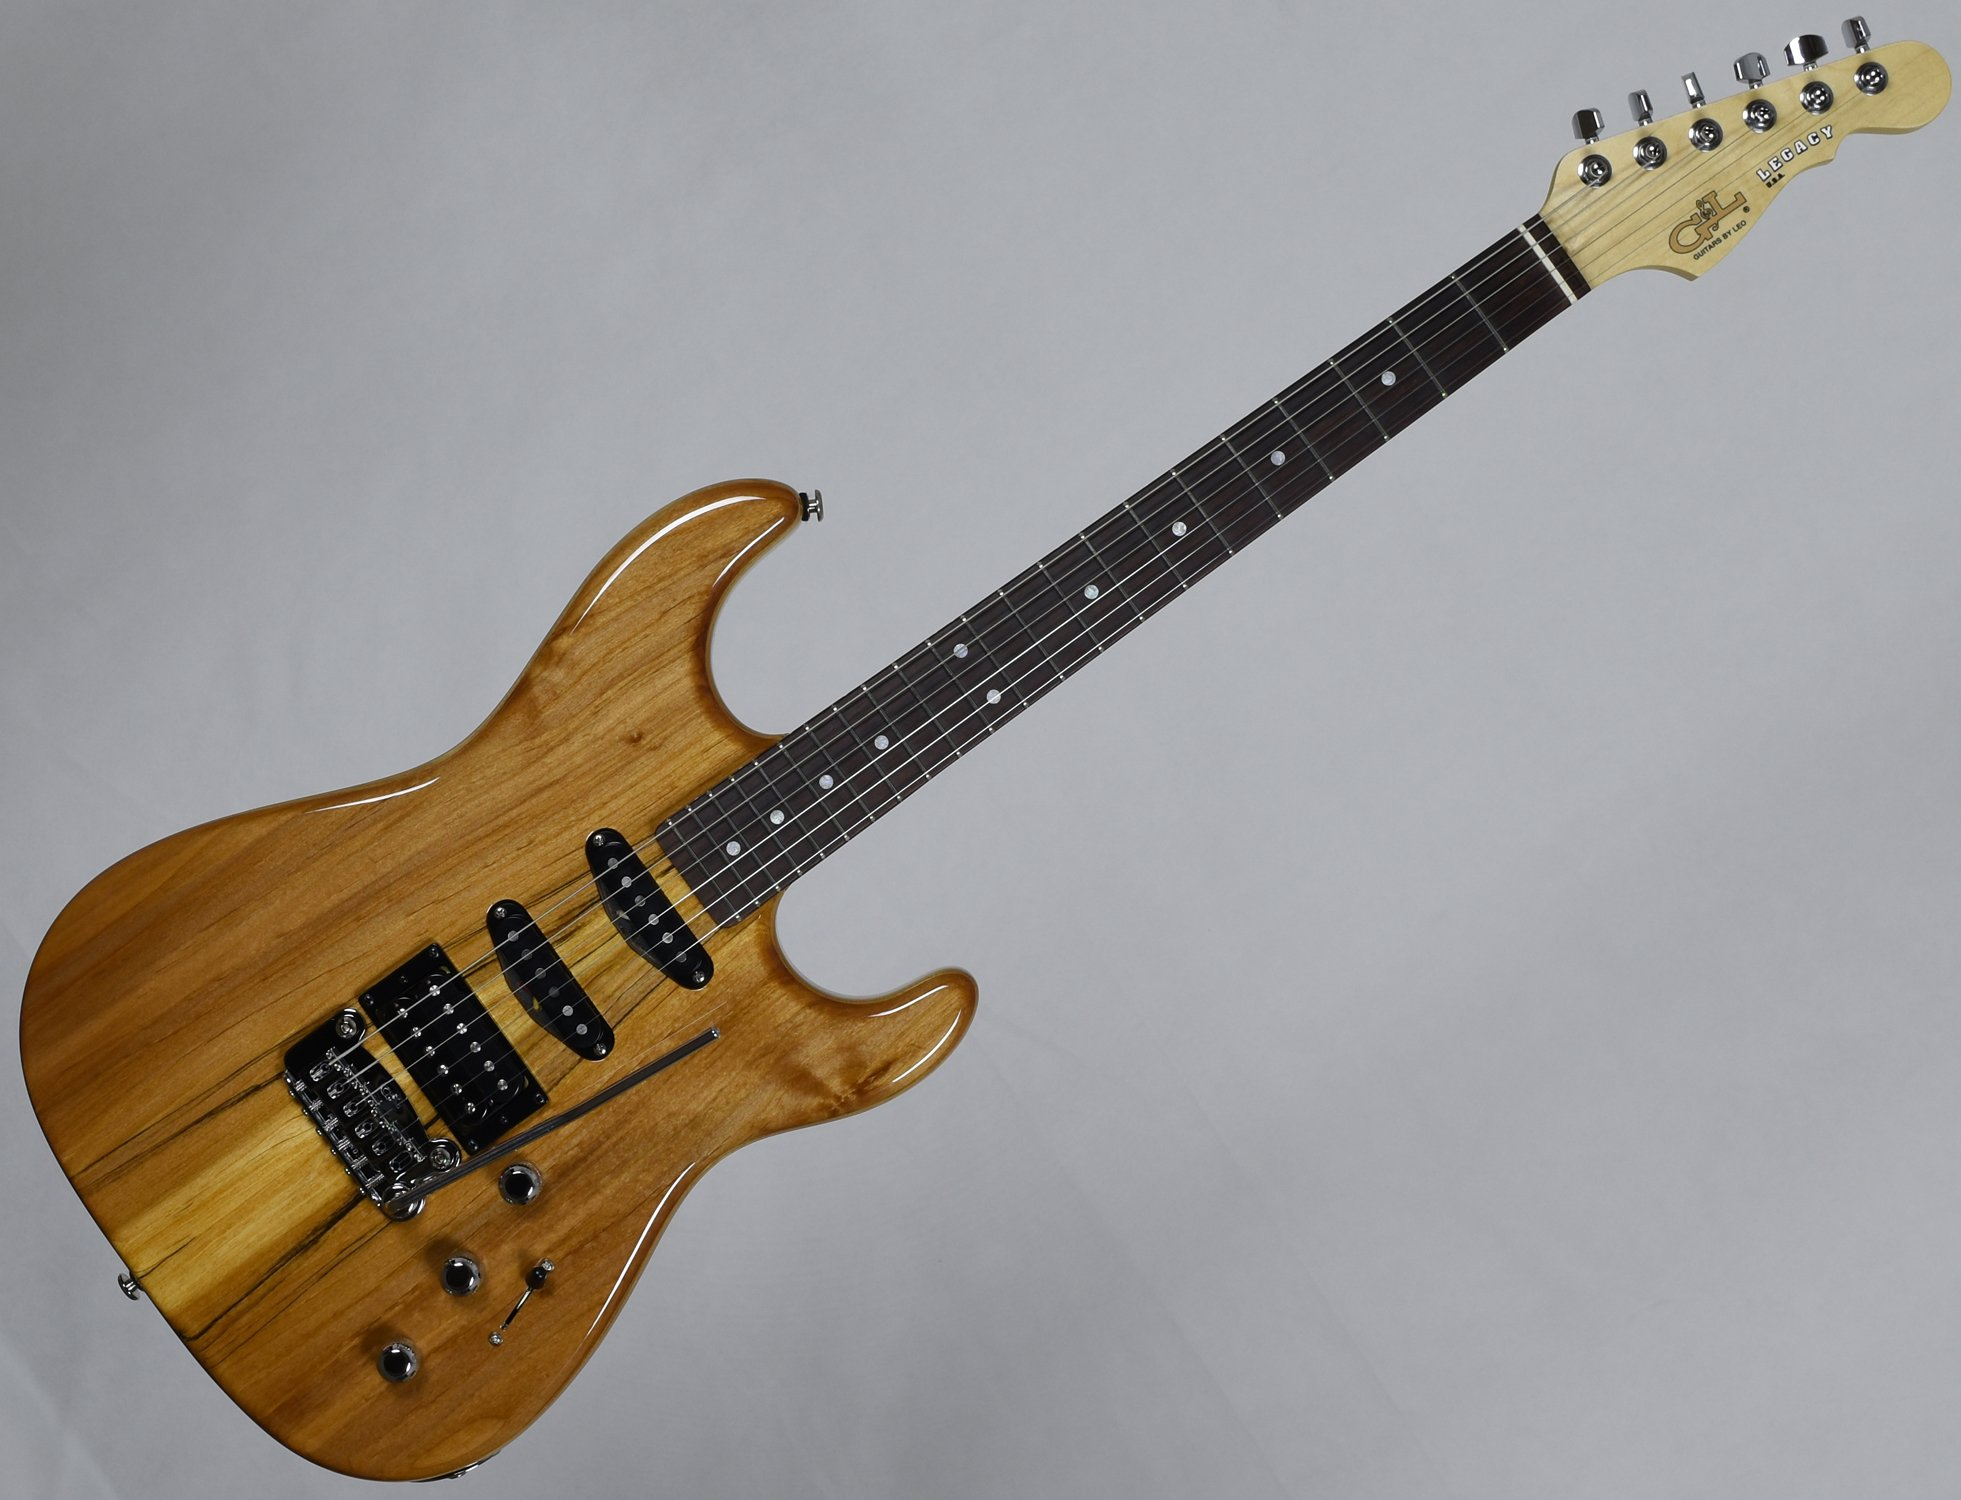 g l usa legacy spalted alder top electric guitar in natural gloss finish ebay. Black Bedroom Furniture Sets. Home Design Ideas